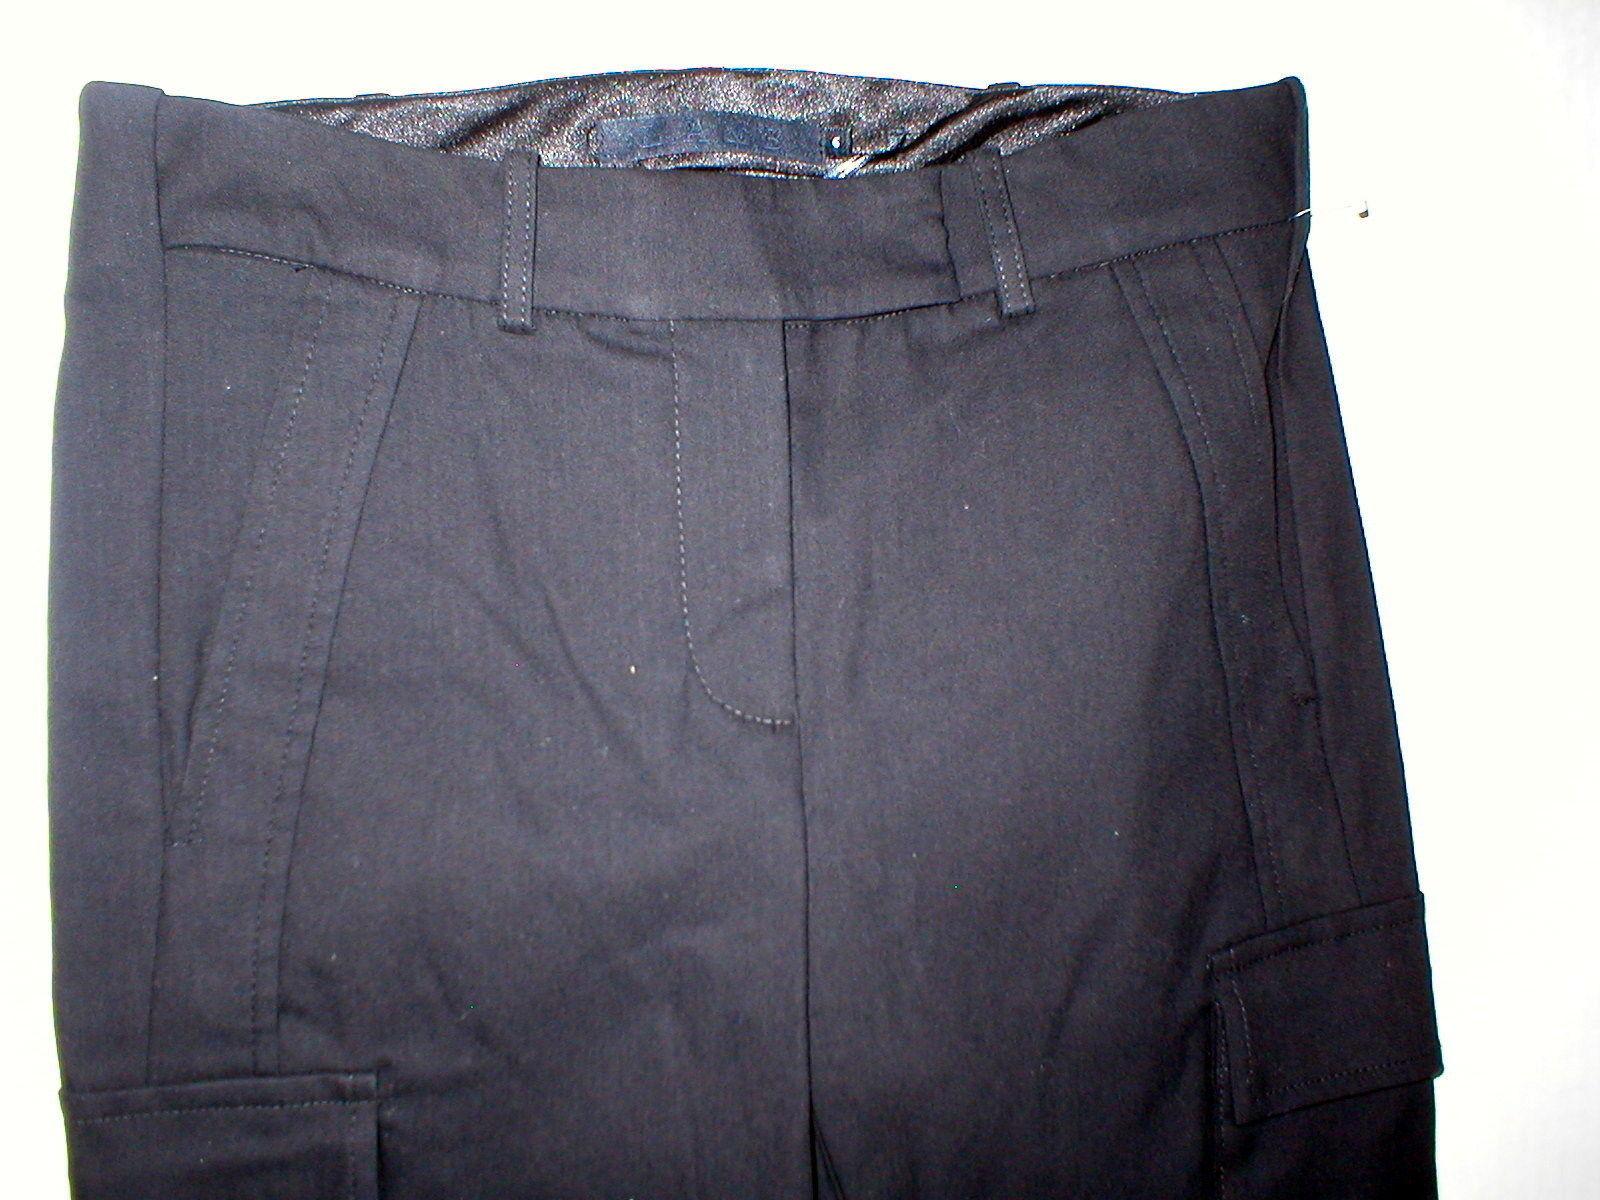 New Womens Designer NWT LAMB Gwen Stefani Cargo Pants Stretch Skinny 6 Black image 4